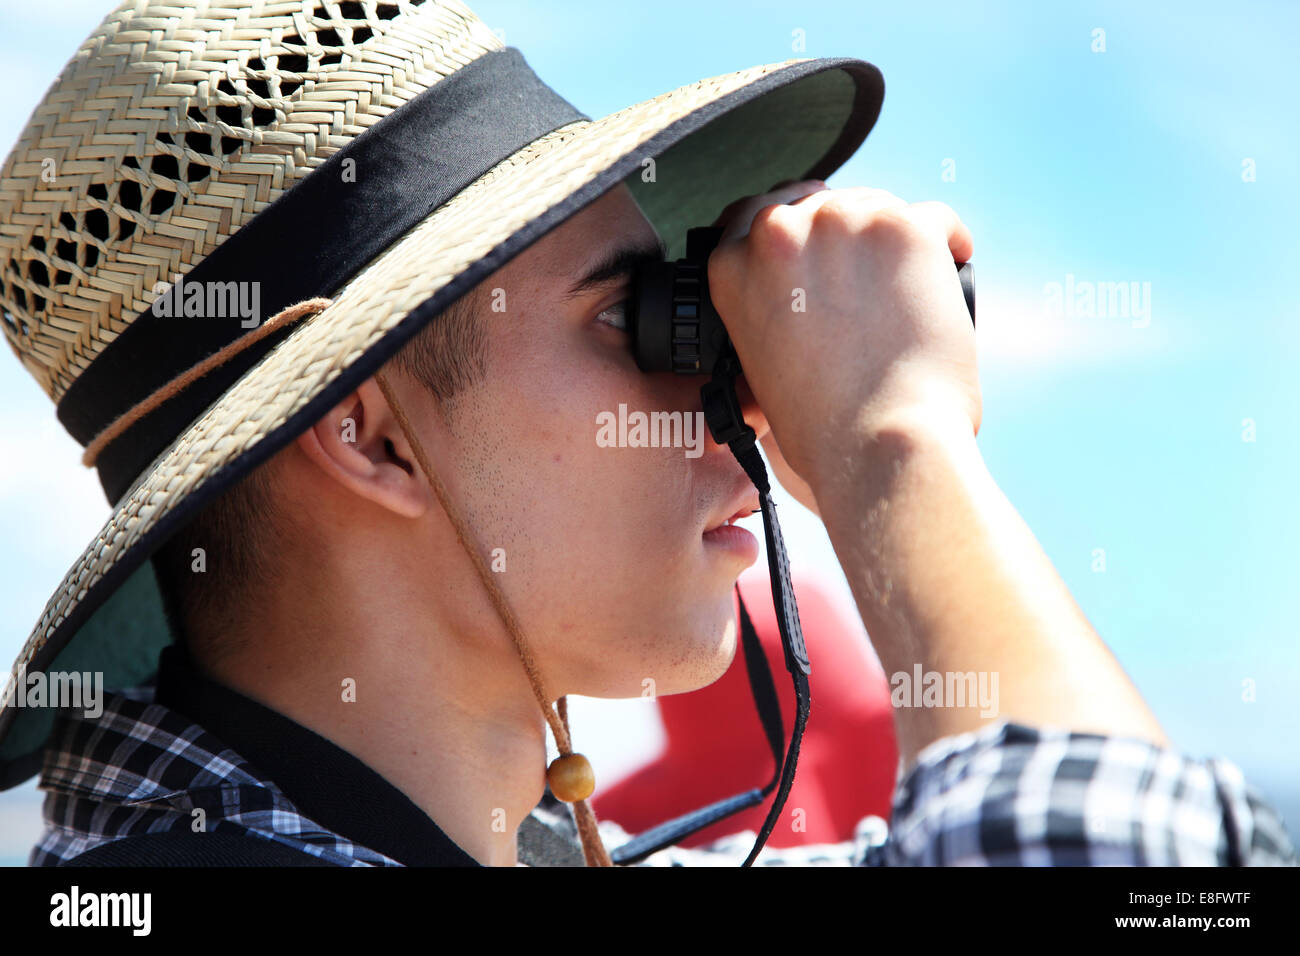 Australia, Nuovo Galles del Sud, Sydney, Man looking through binoculars - Stock Image